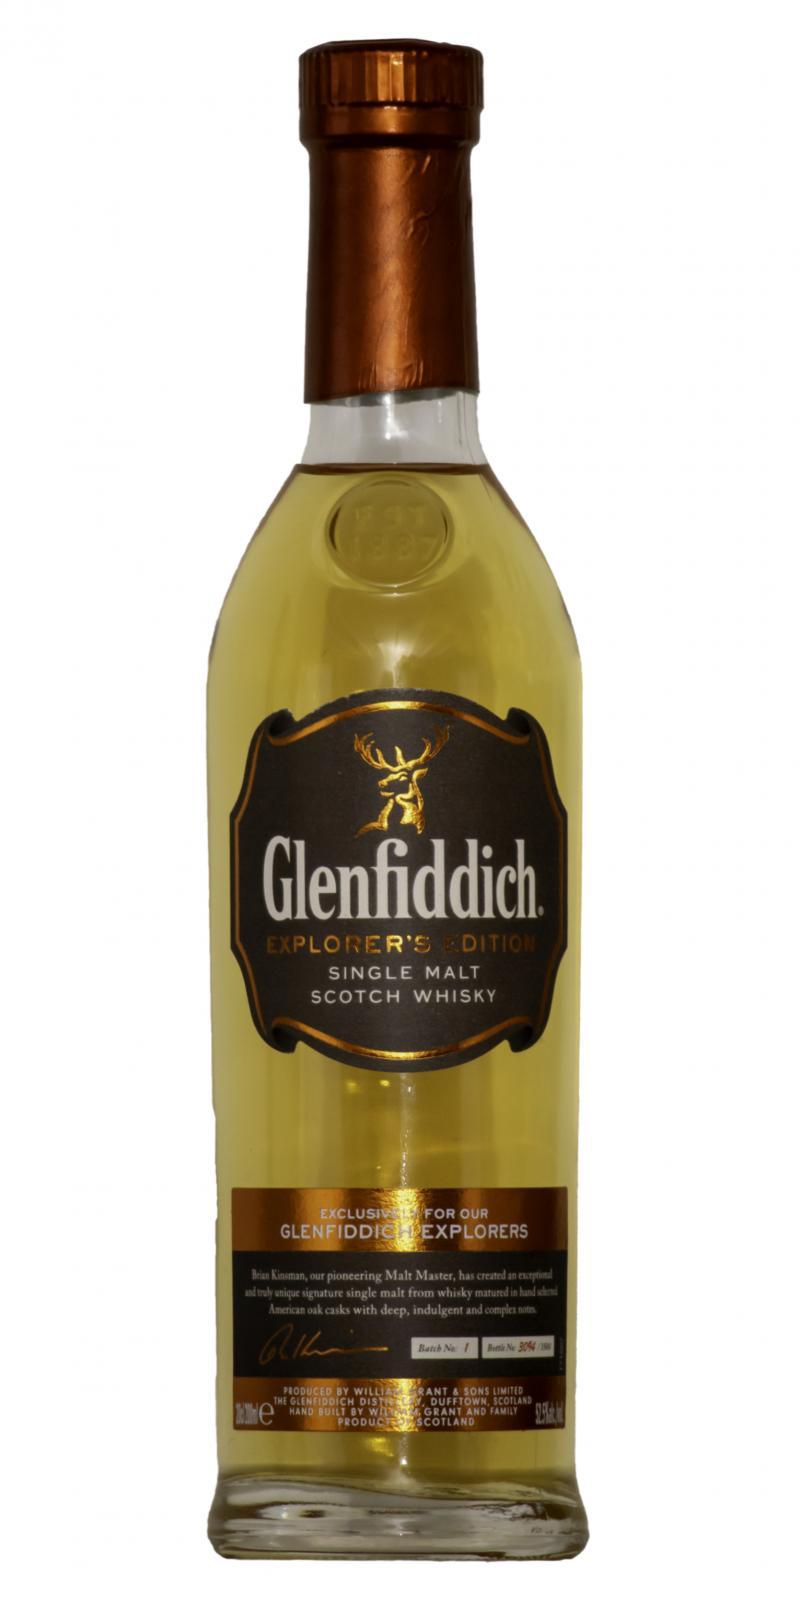 Glenfiddich Explorer's Edition